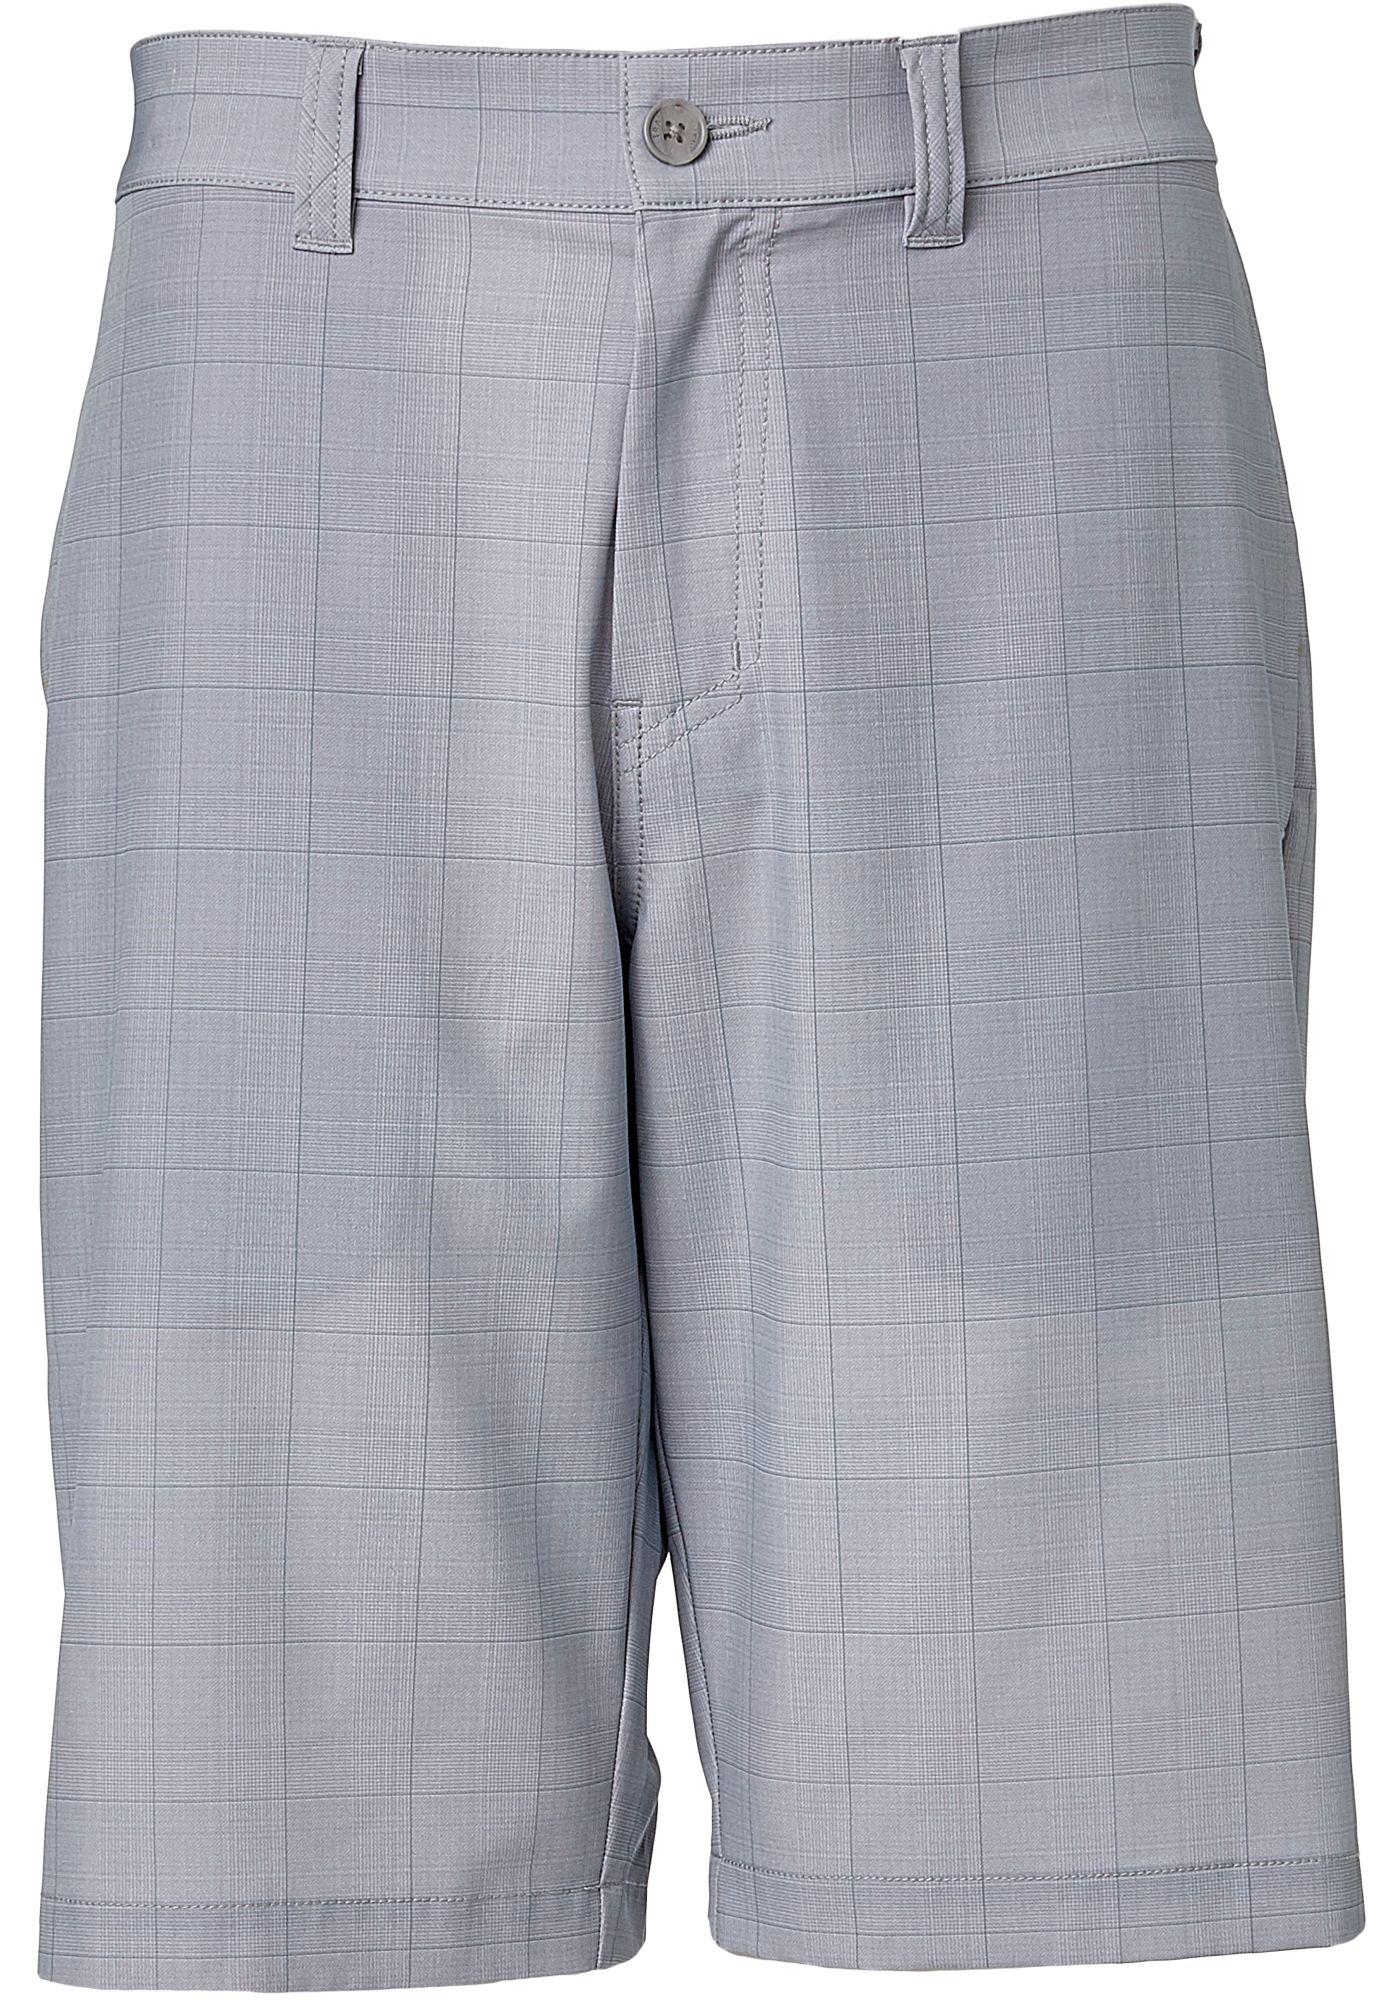 TravisMathew Men's Pacifica Golf Shorts